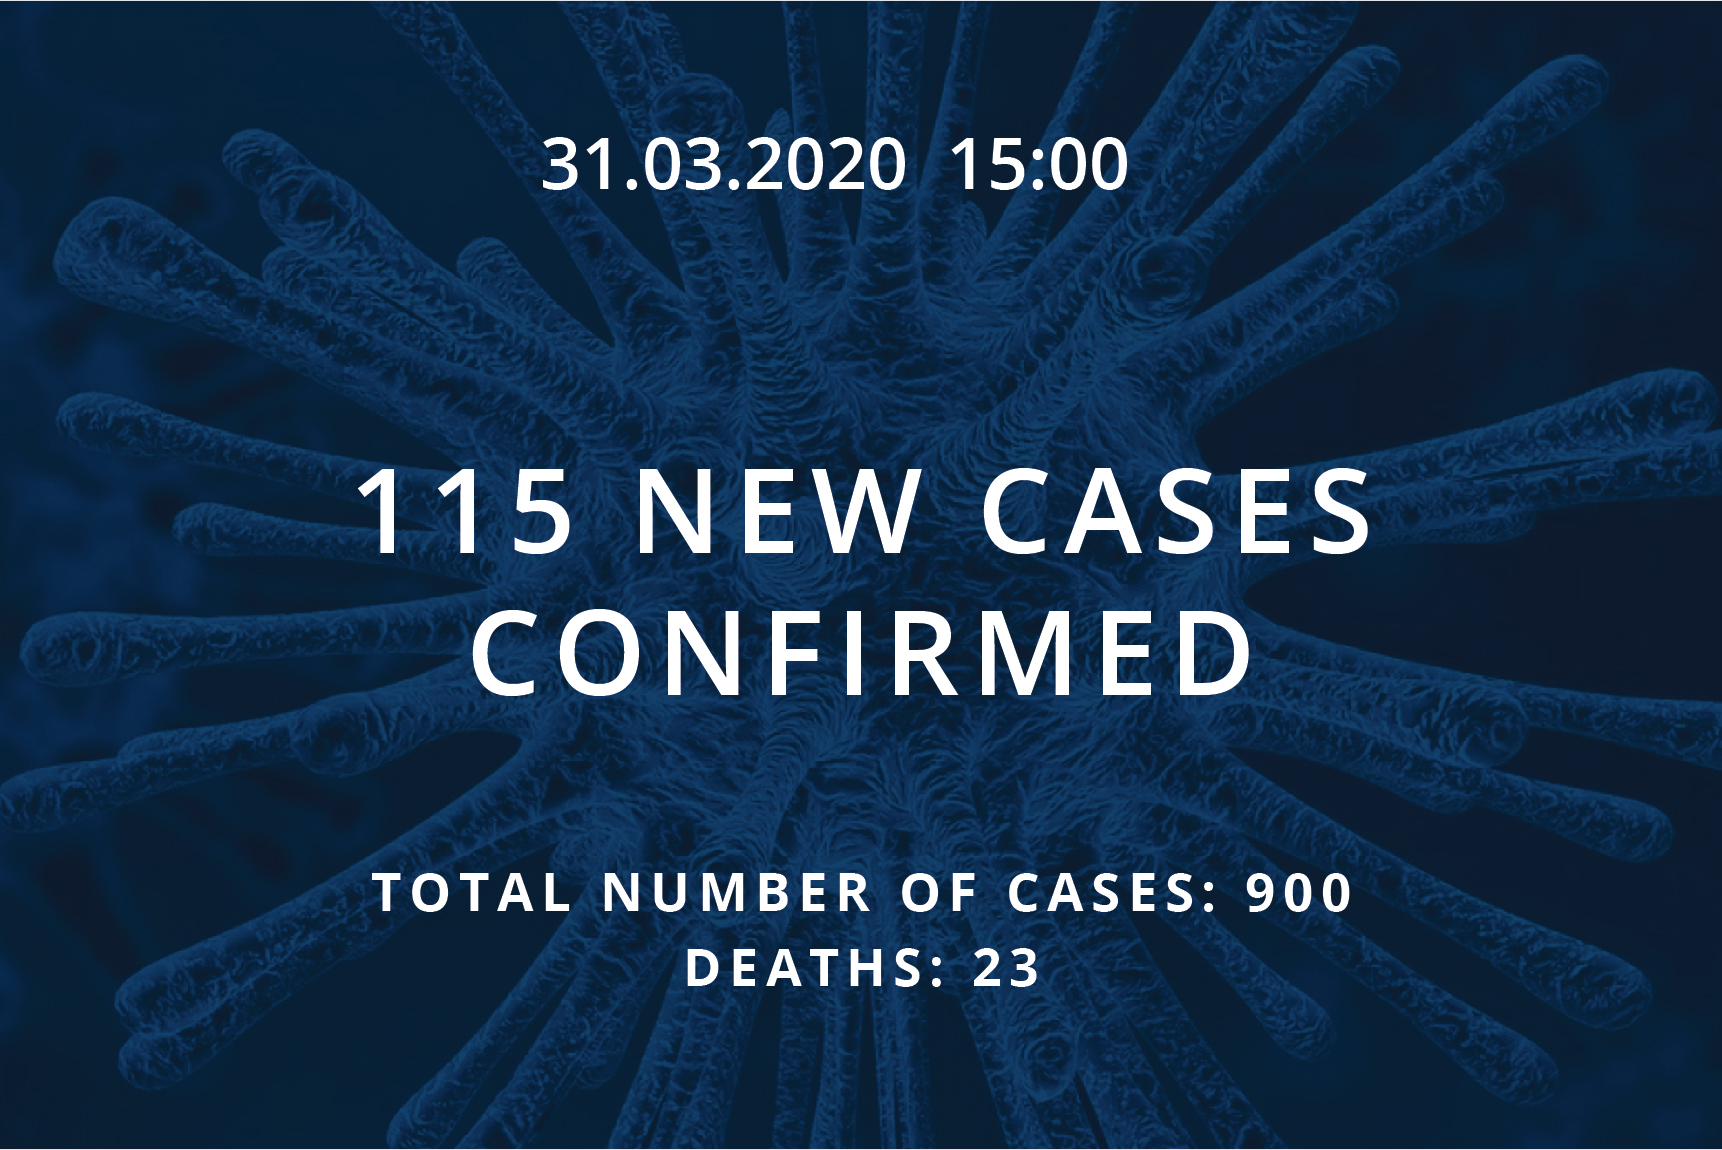 Information about coronavirus COVID-19, 31.03.2020 at 15:00